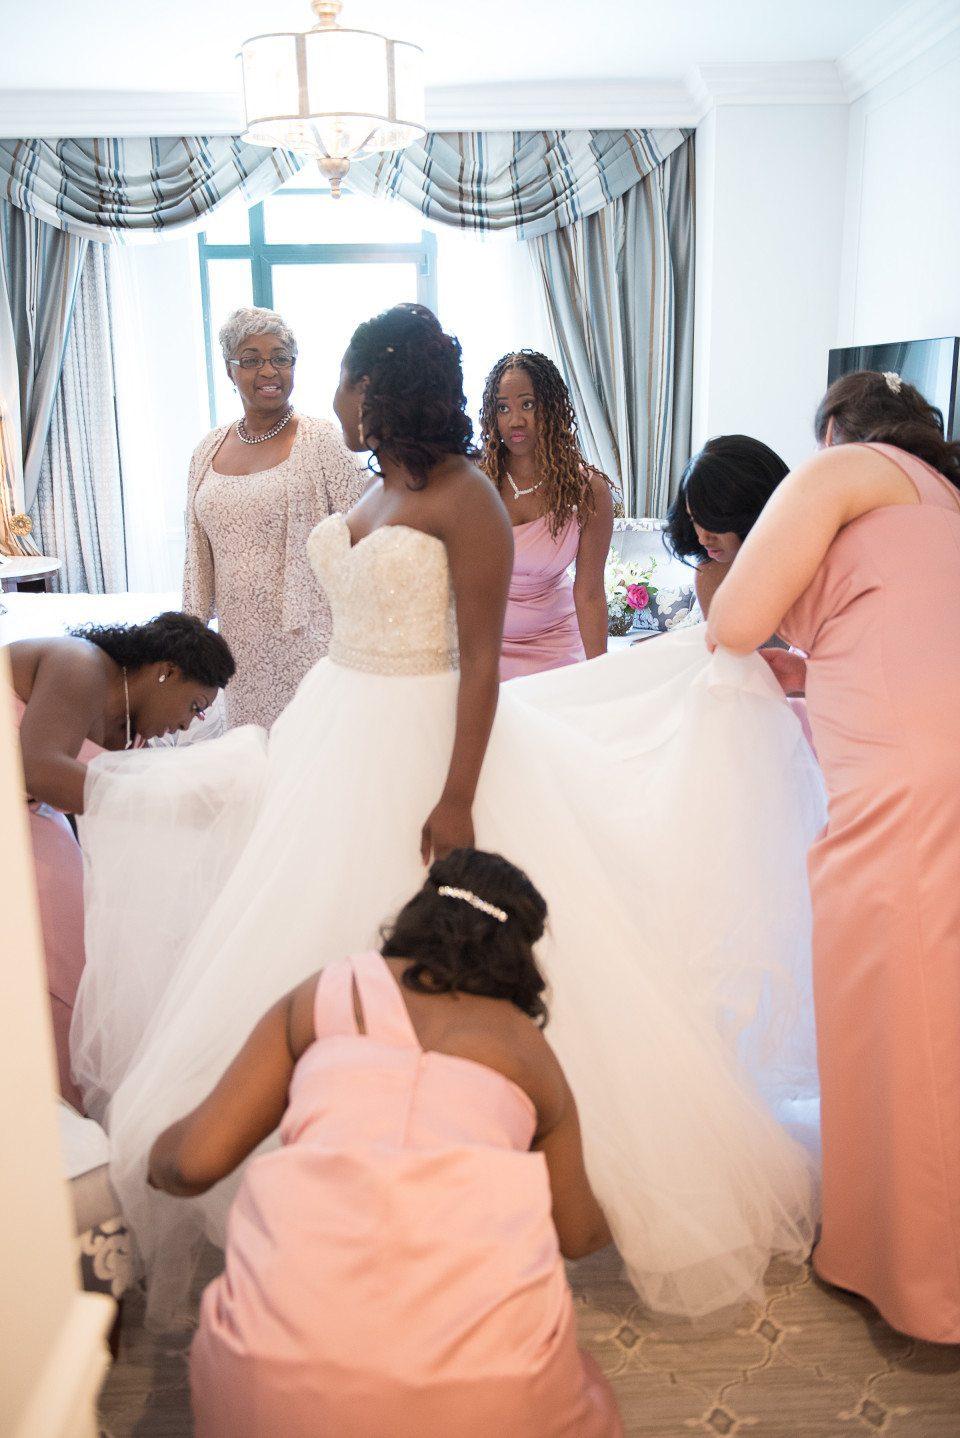 Getting-Dressed-40-of-73-960x1438 Classic Charleston Nuptials